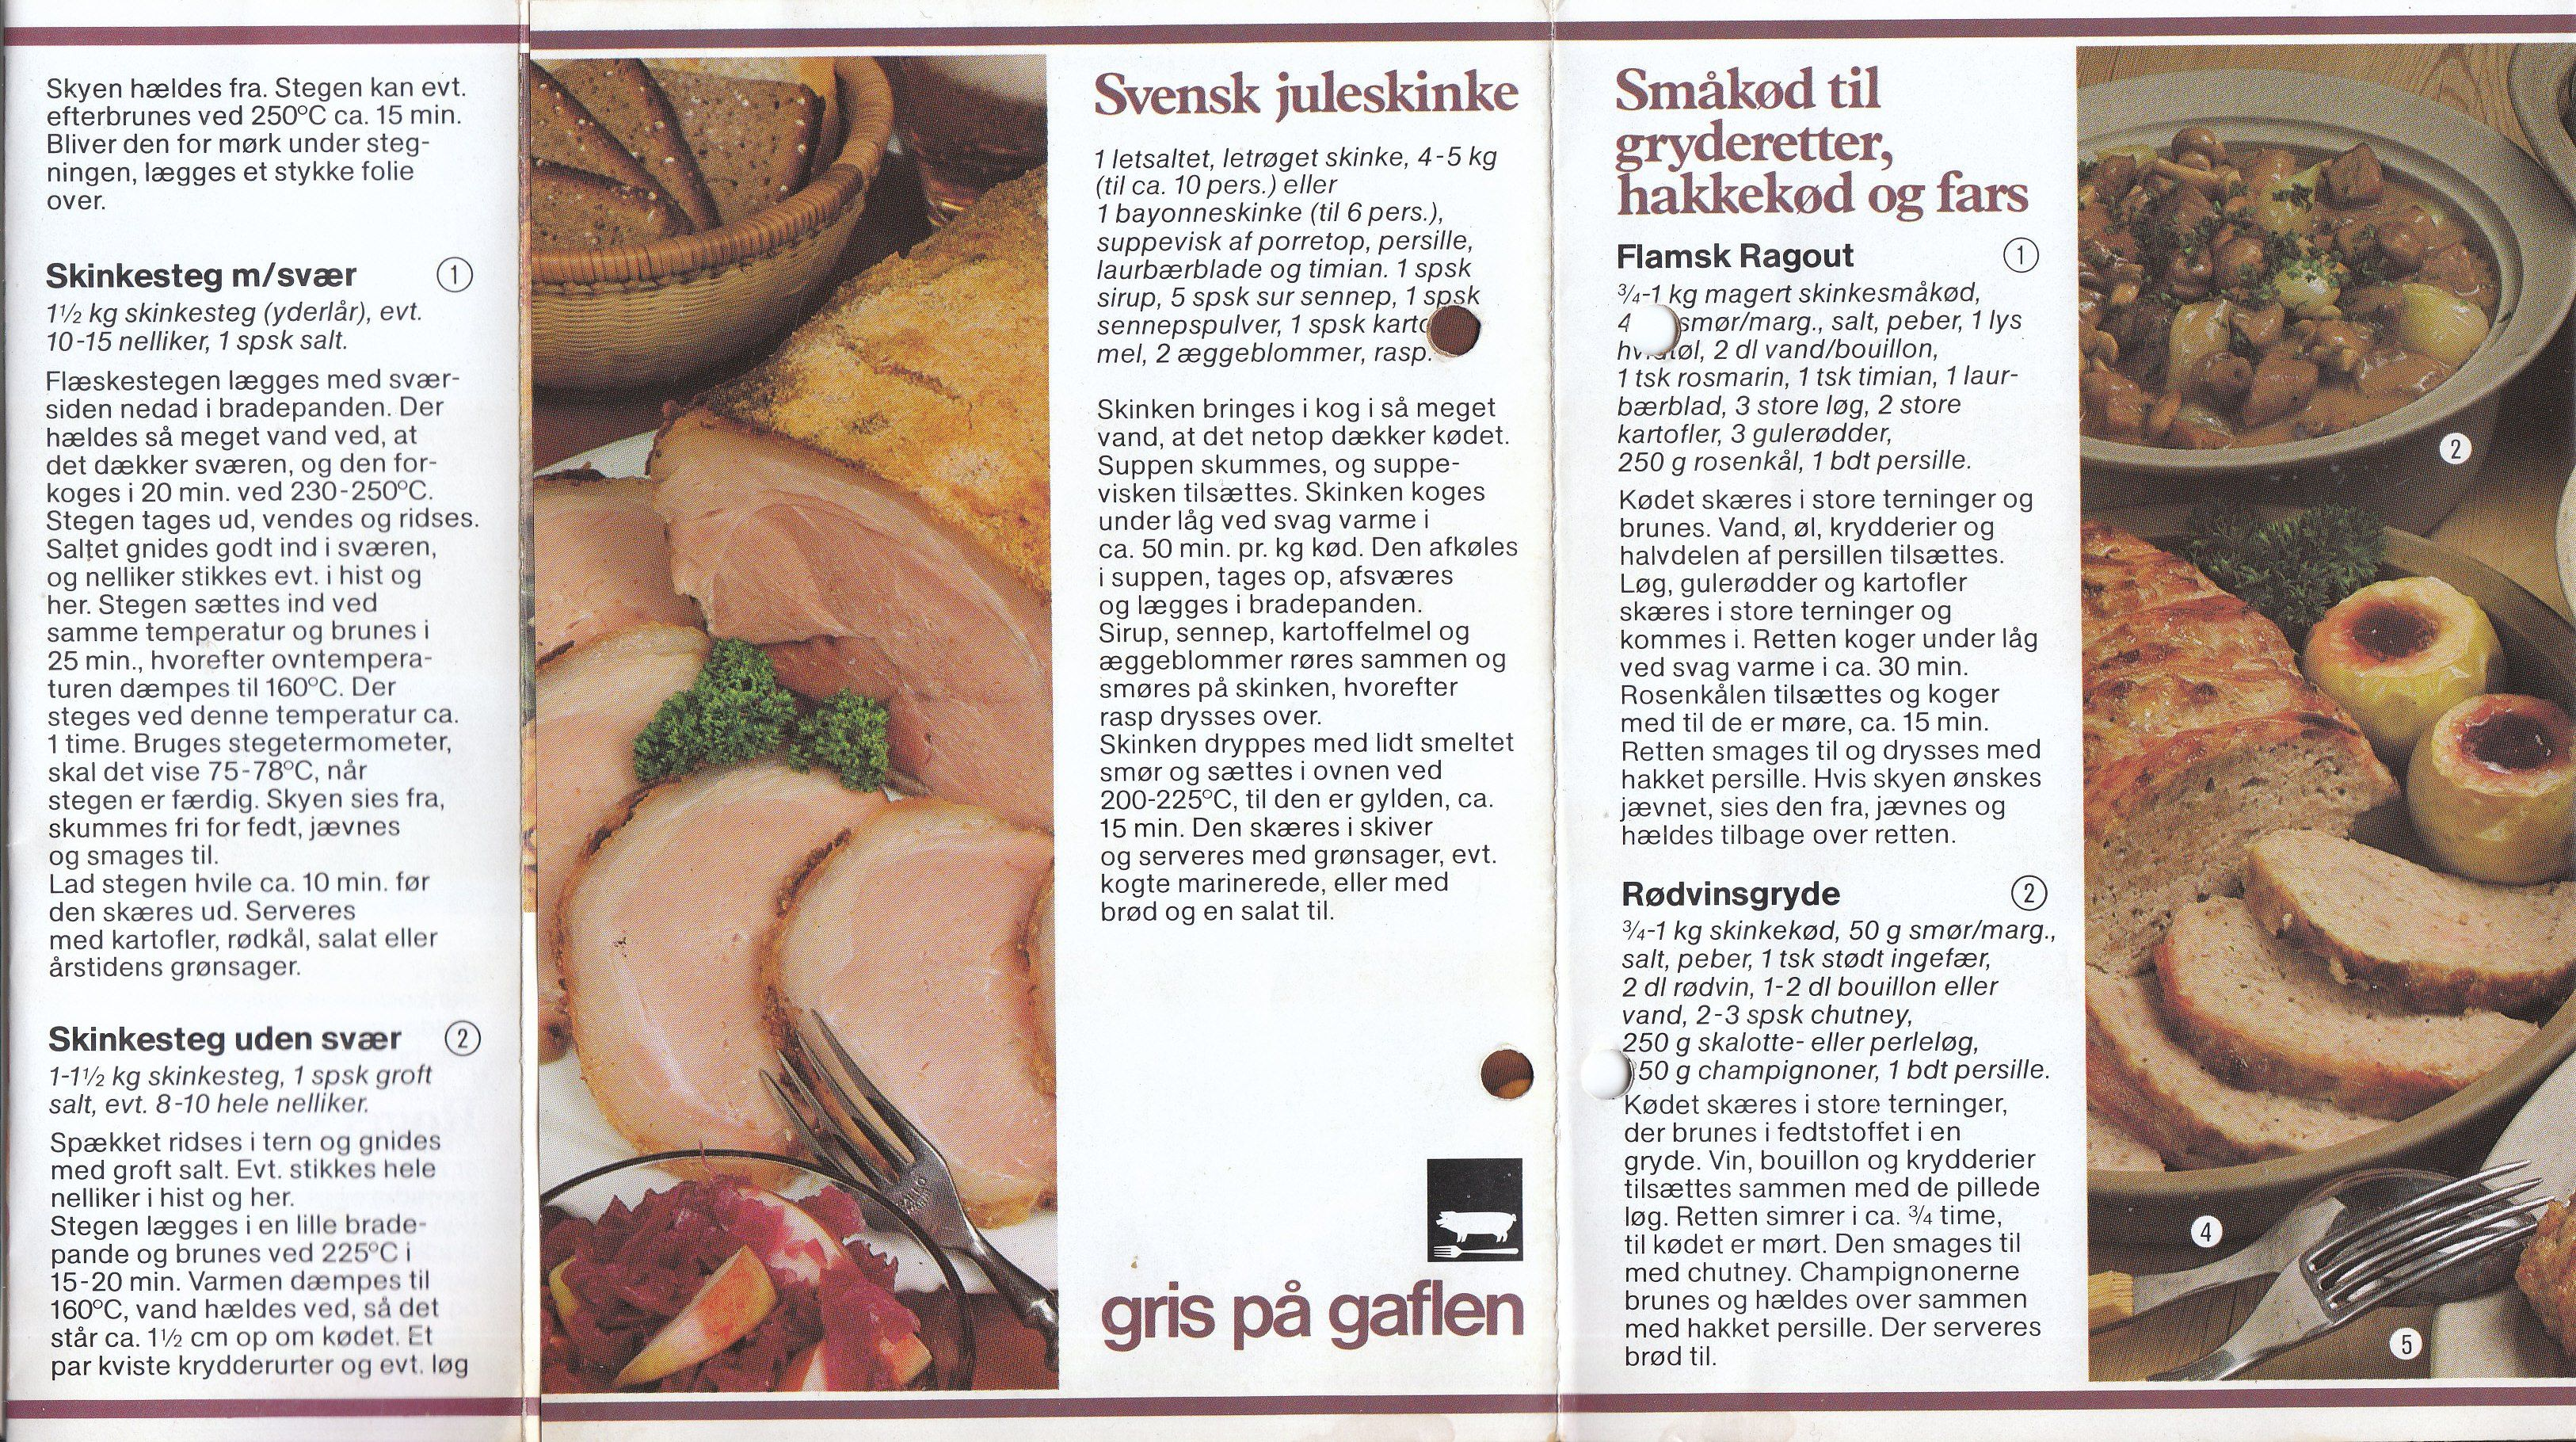 Skinkekød